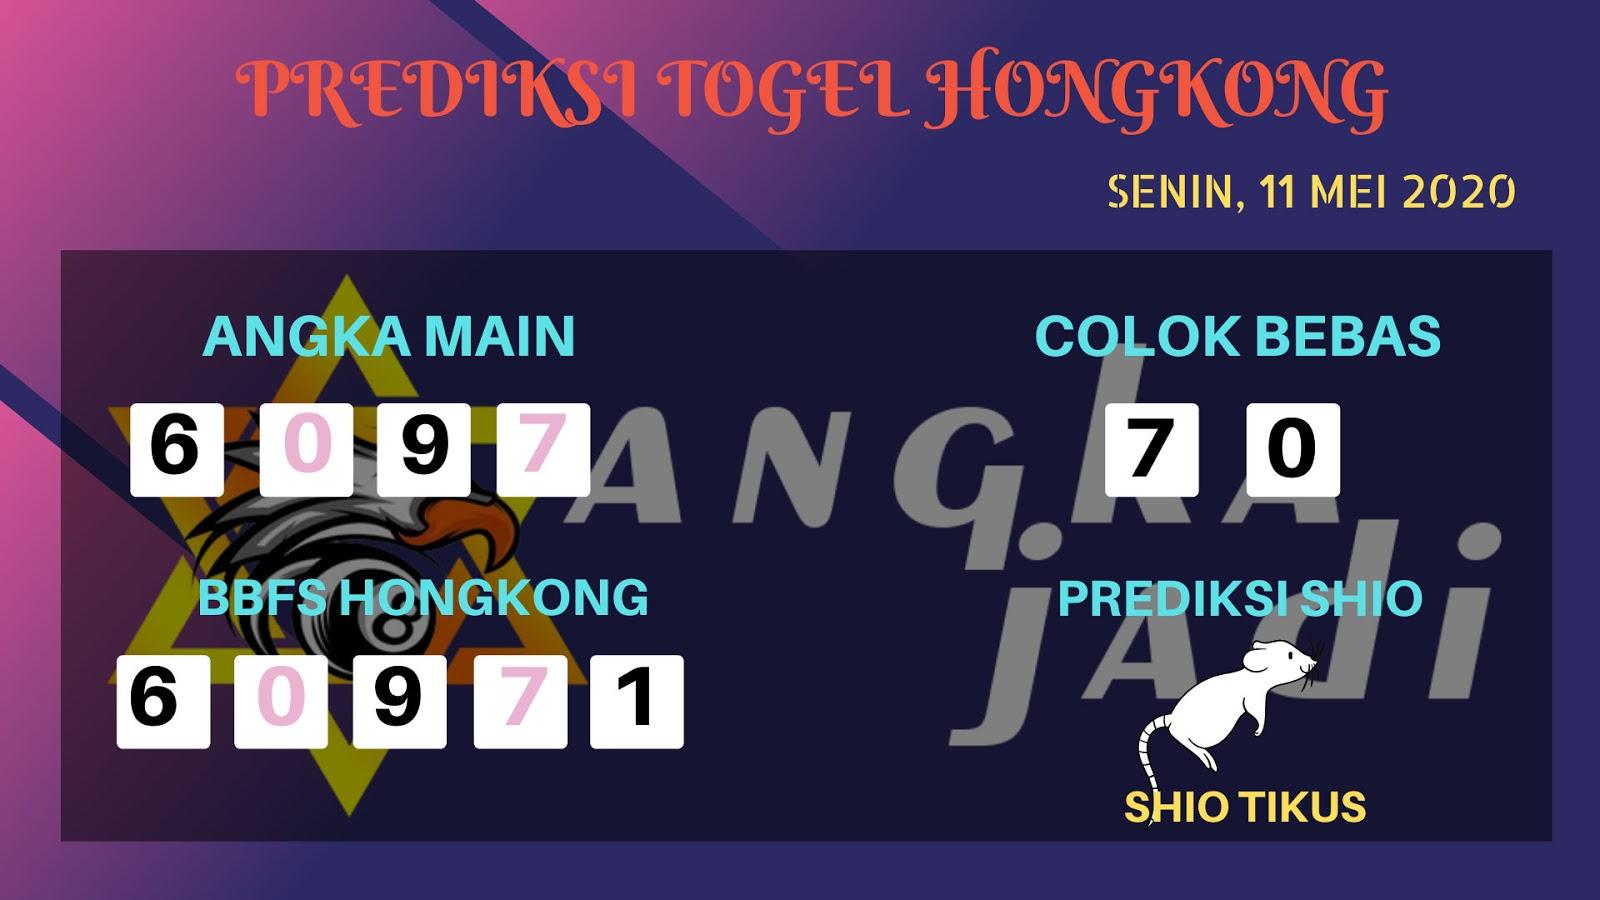 Prediksi Togel Hongkong Senin 11 Mei 2020 - Prediksi Angka Hongkong